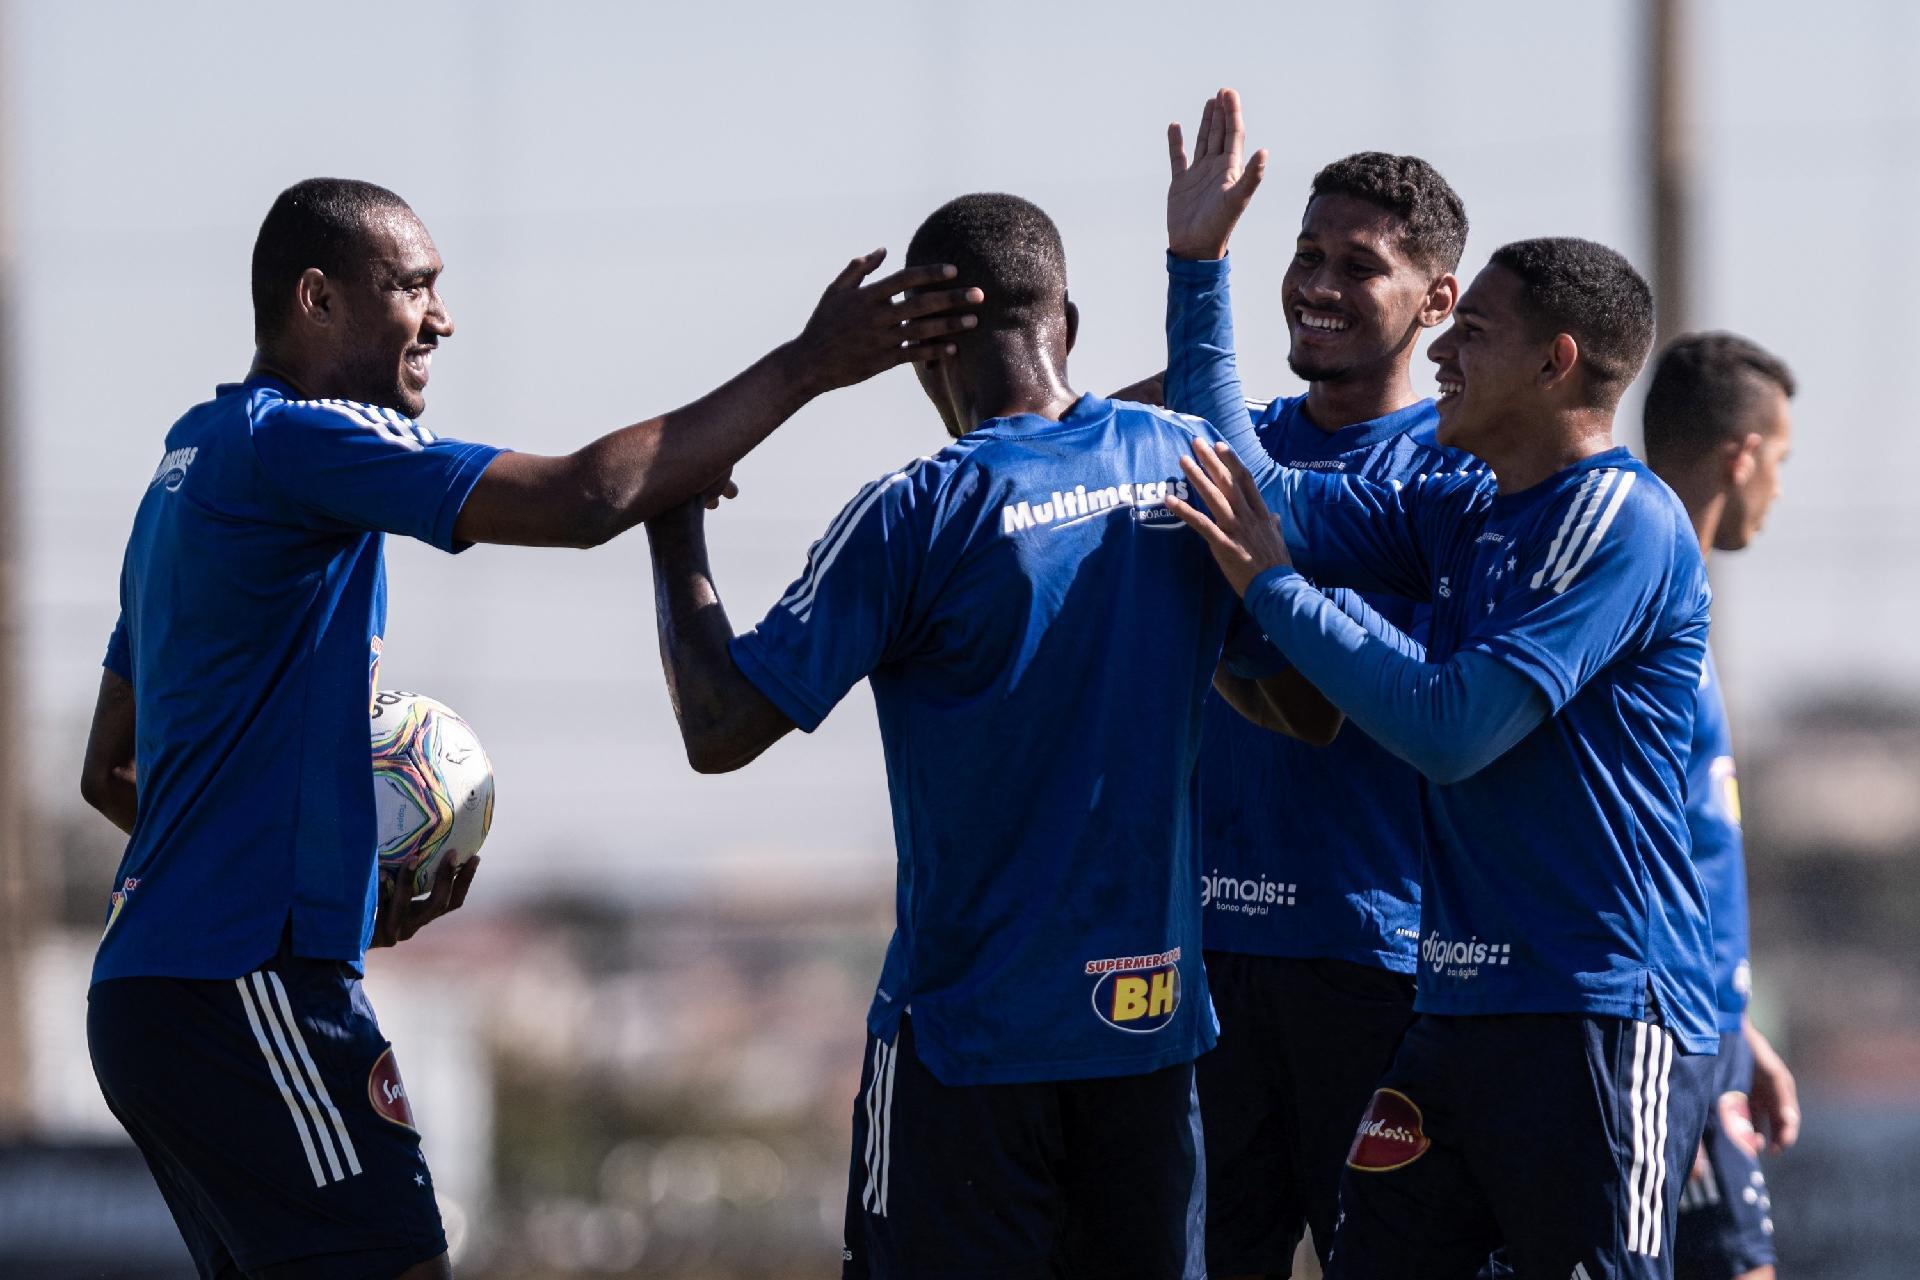 Serie B Do Brasileirao 2020 Cbf Divulga Tabela Das 9 Primeiras Rodadas